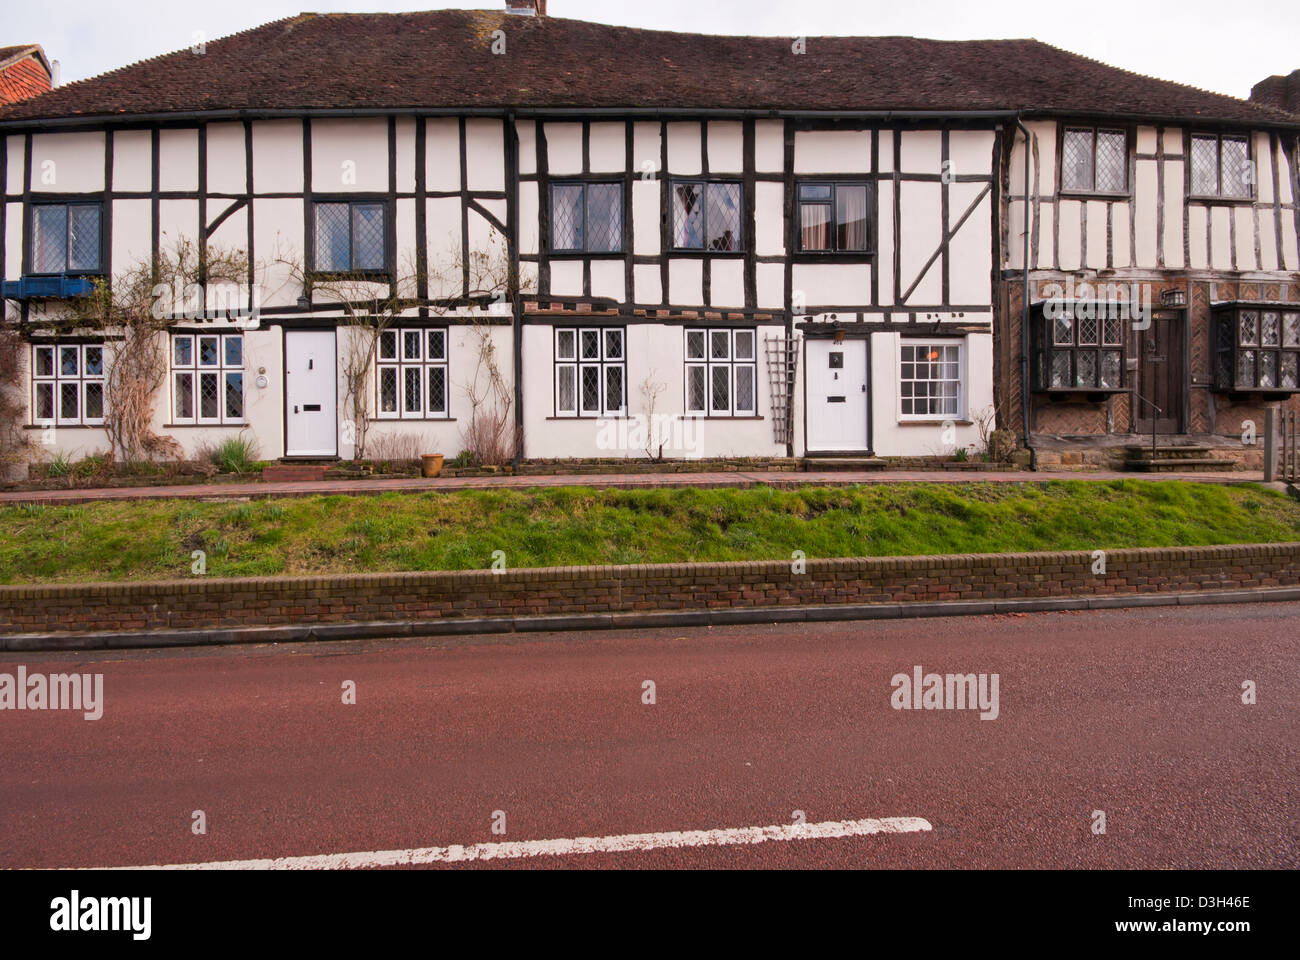 Period Tudor Houses in Robertsbridge East Sussex UK - Stock Image